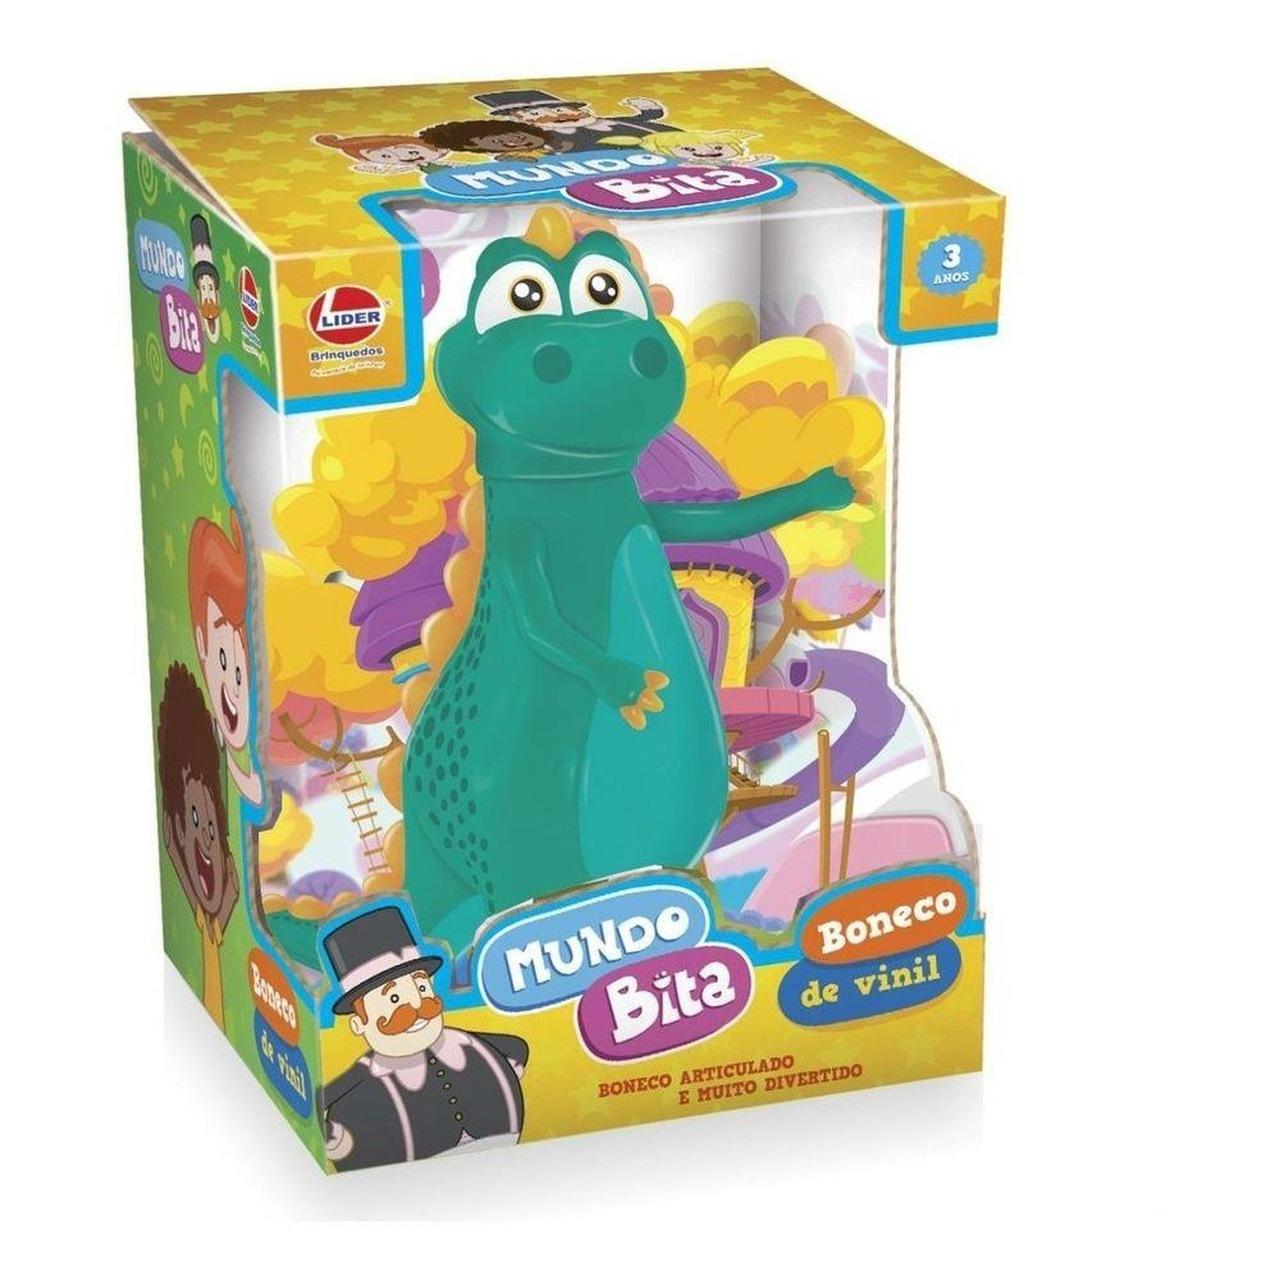 Boneco Vinil Dinossauro Argo Mundo Bita Oficial Lider Brinquedos